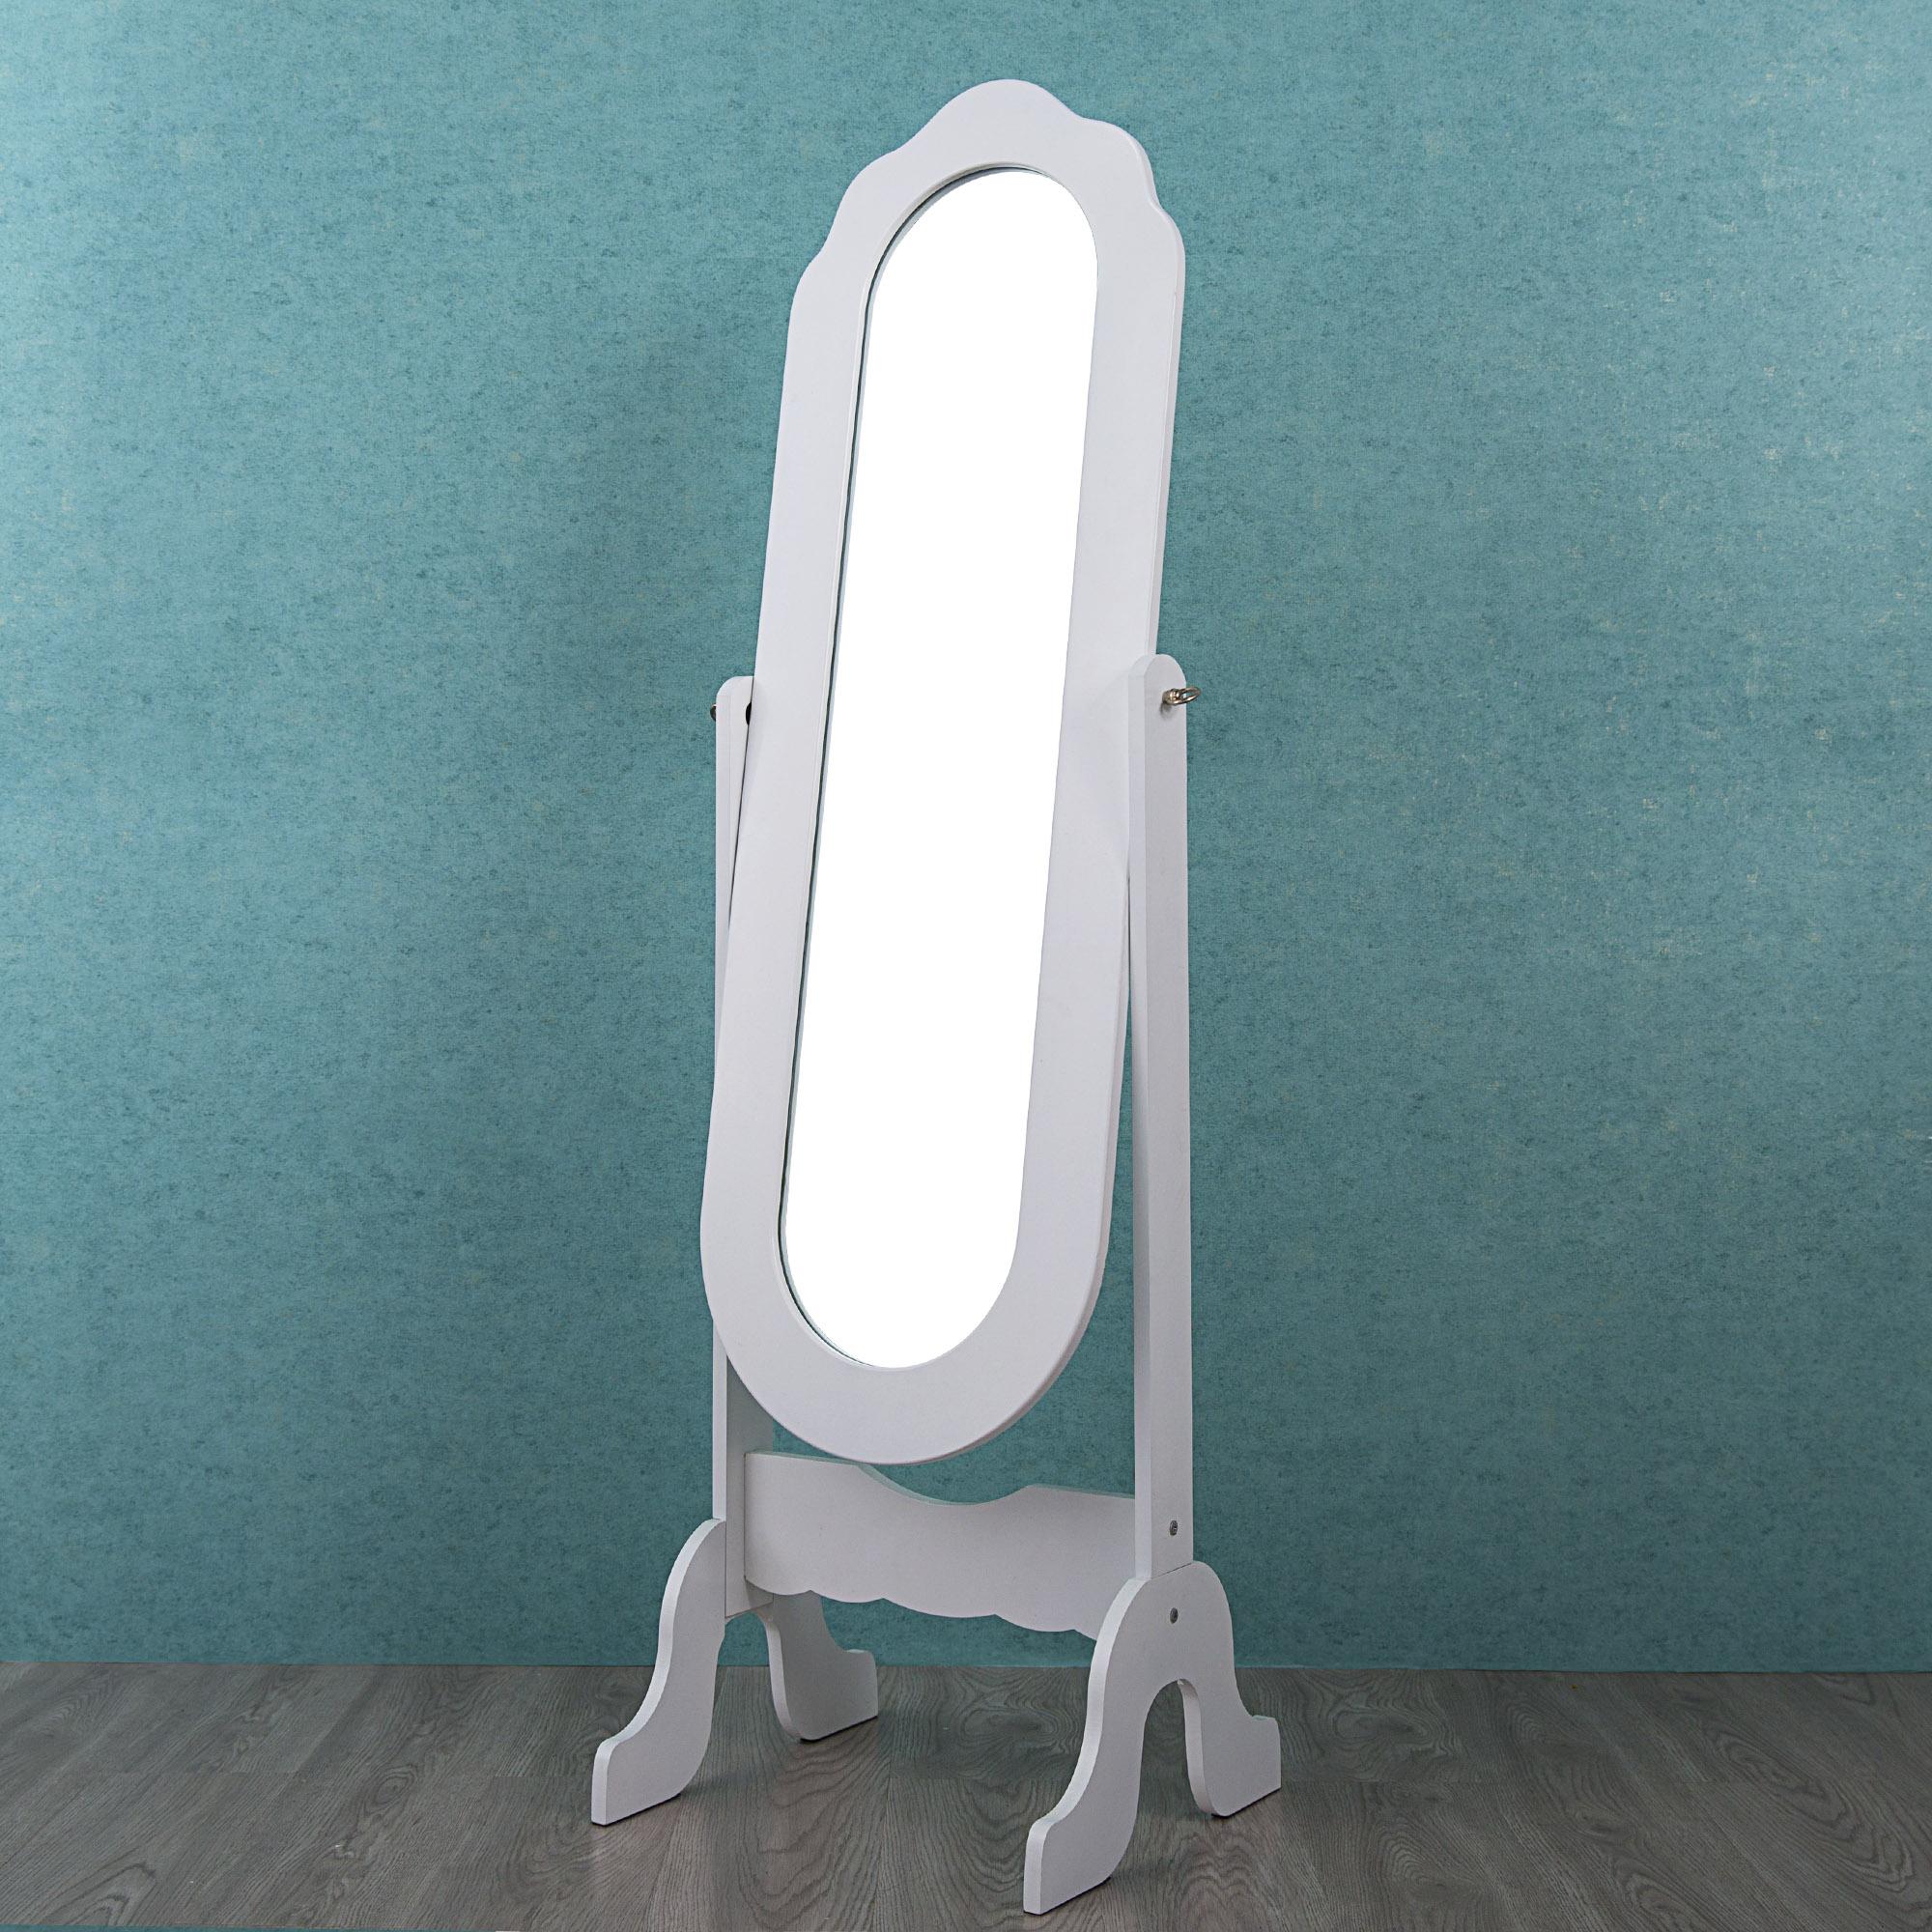 Cloud Mountain Dressing Mirror Cheval Style Full Length Rectangular Mirror Bedroom Floor Mirror Adjustable Tilt, White by Cloud Mountain